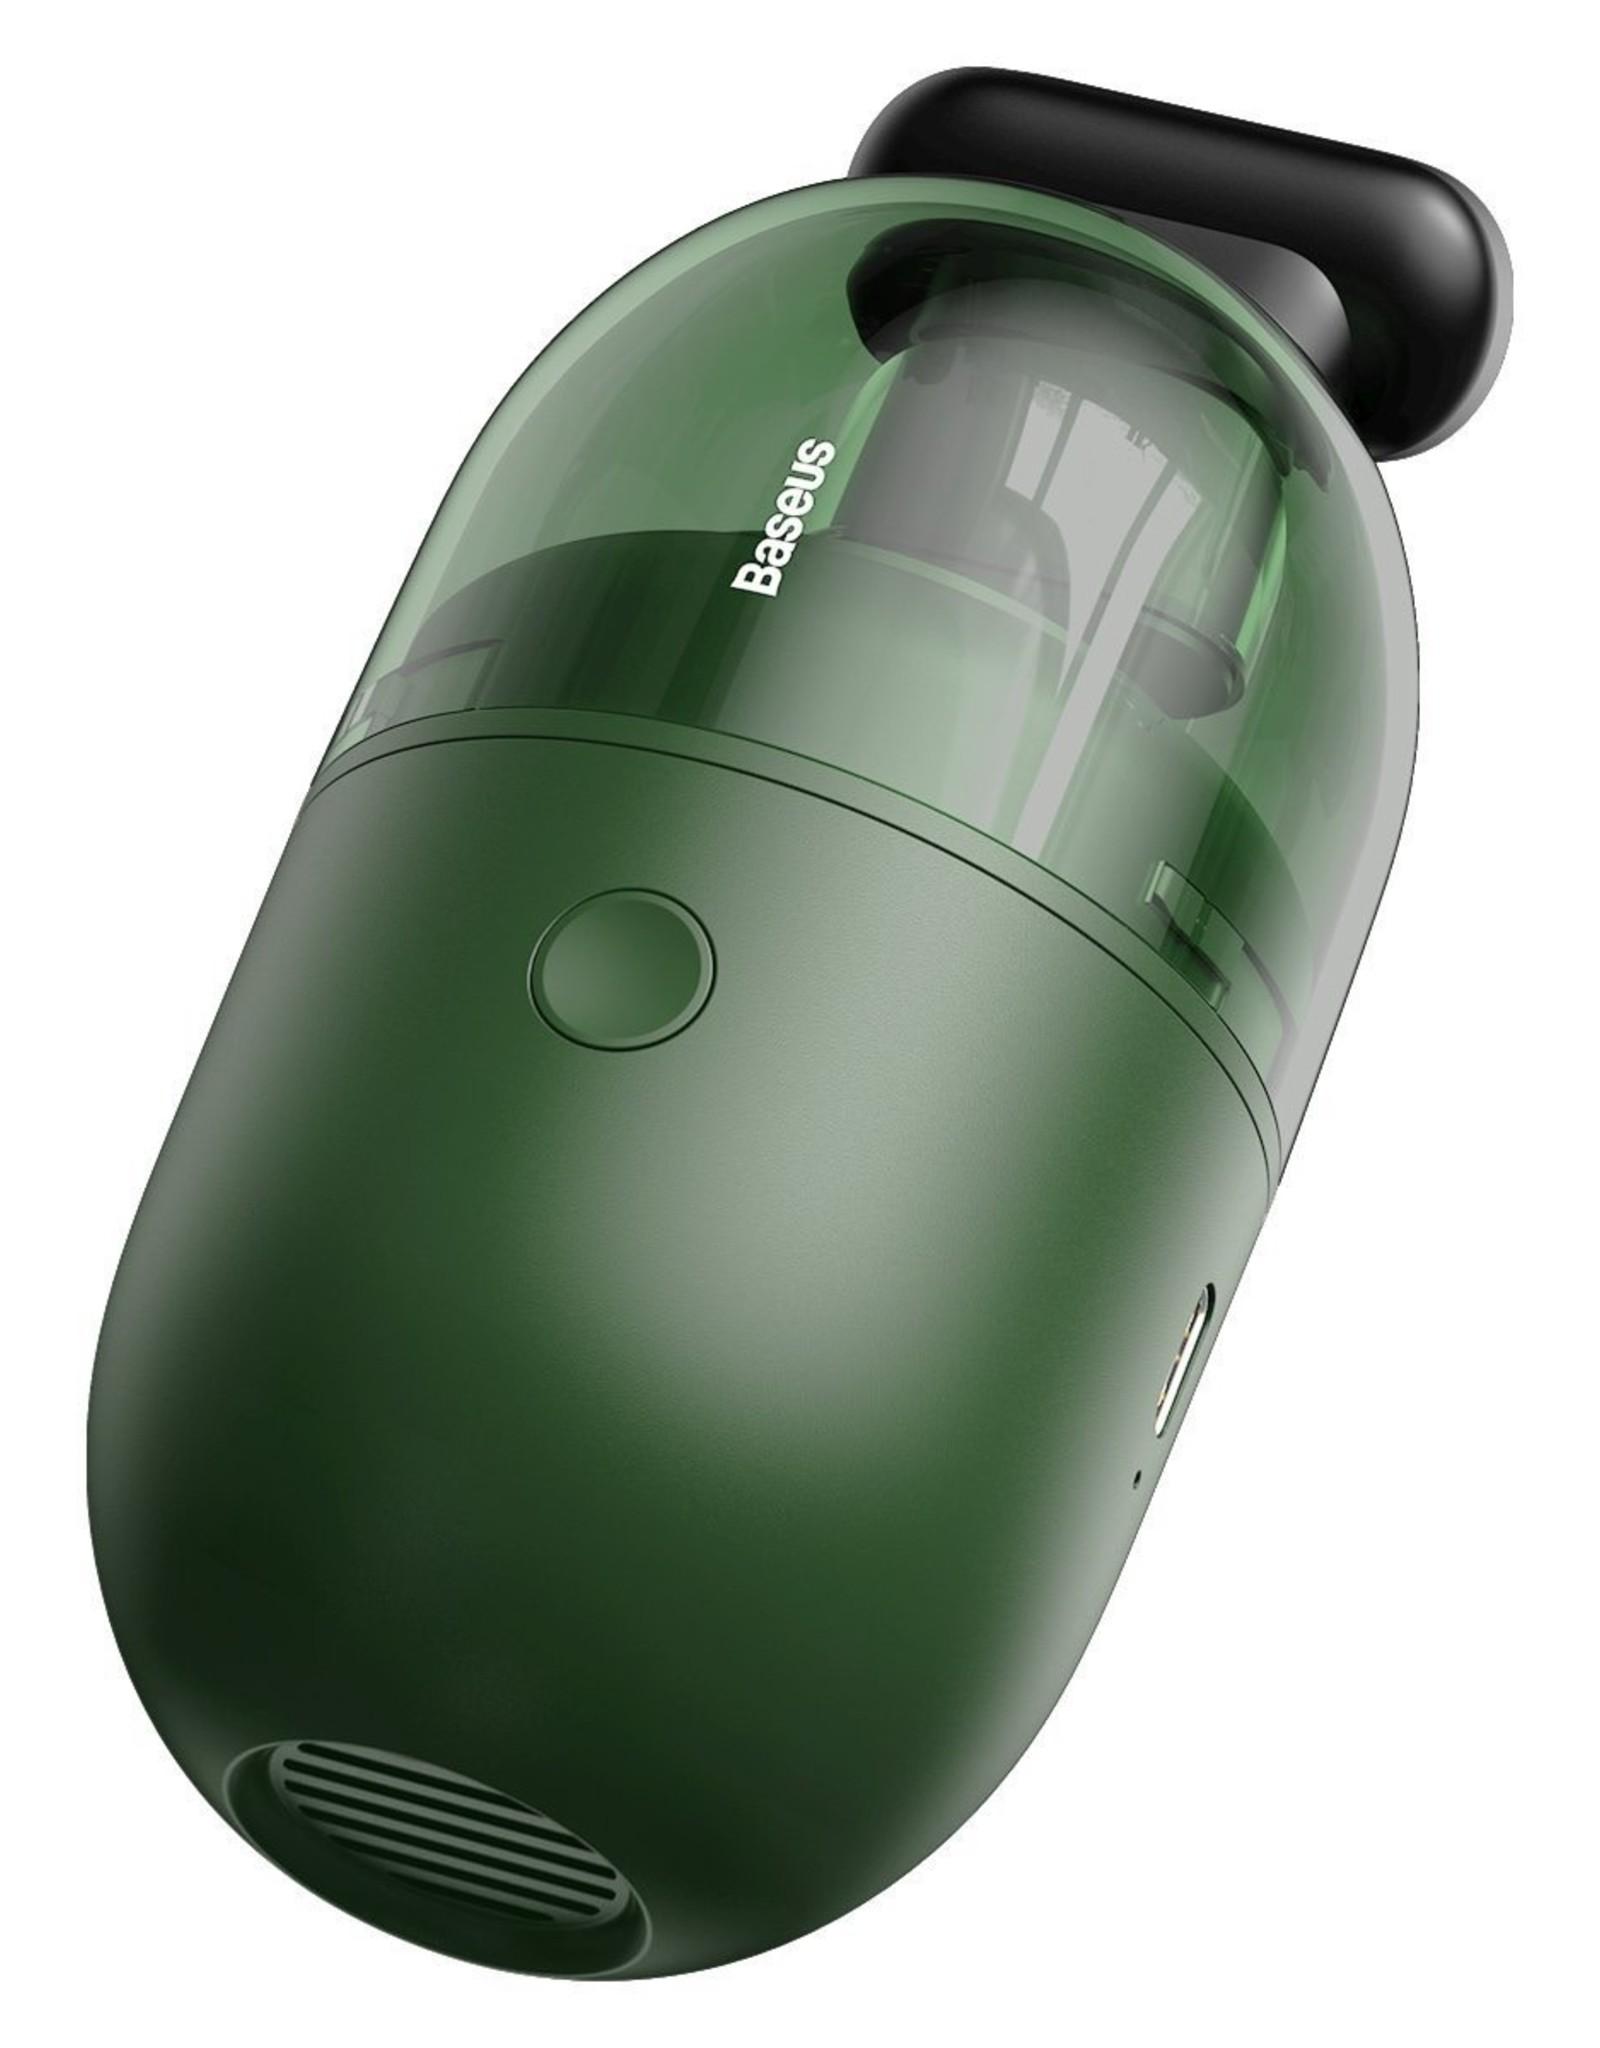 Baseus C2 Desktop Capsule Vacuum Cleaner Green